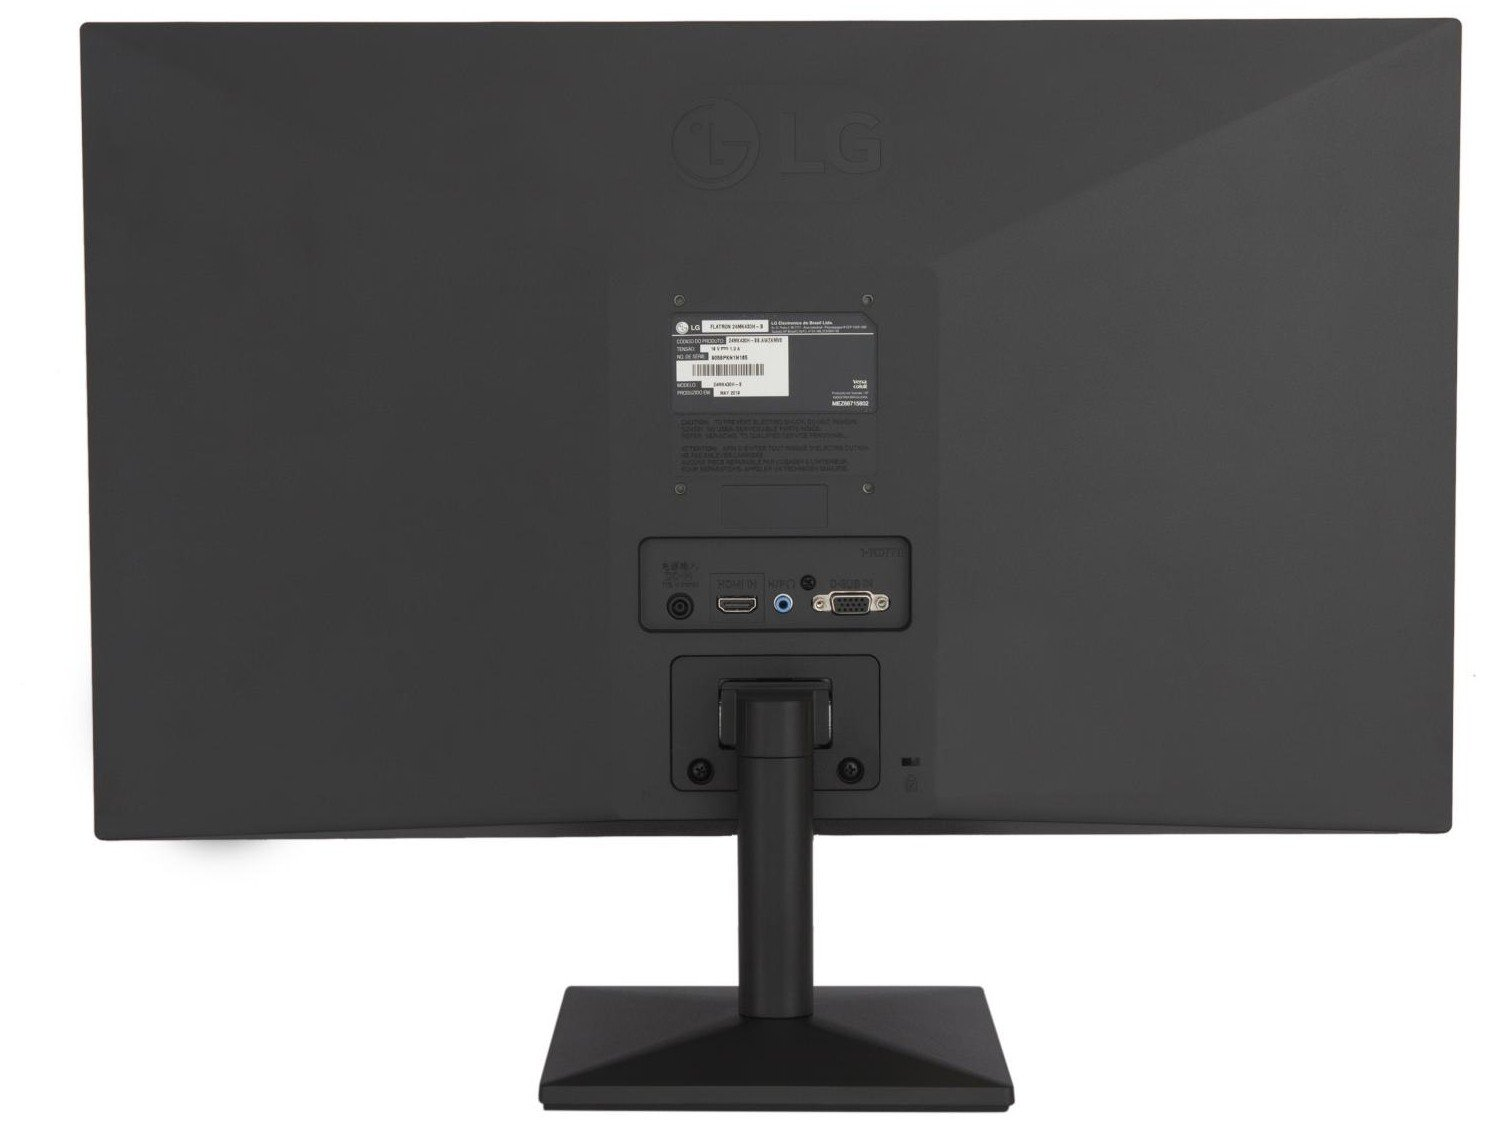 Foto 7 - Monitor para PC Full HD LG LED IPS 23,8 - 24MK430HN/AB.AWZ